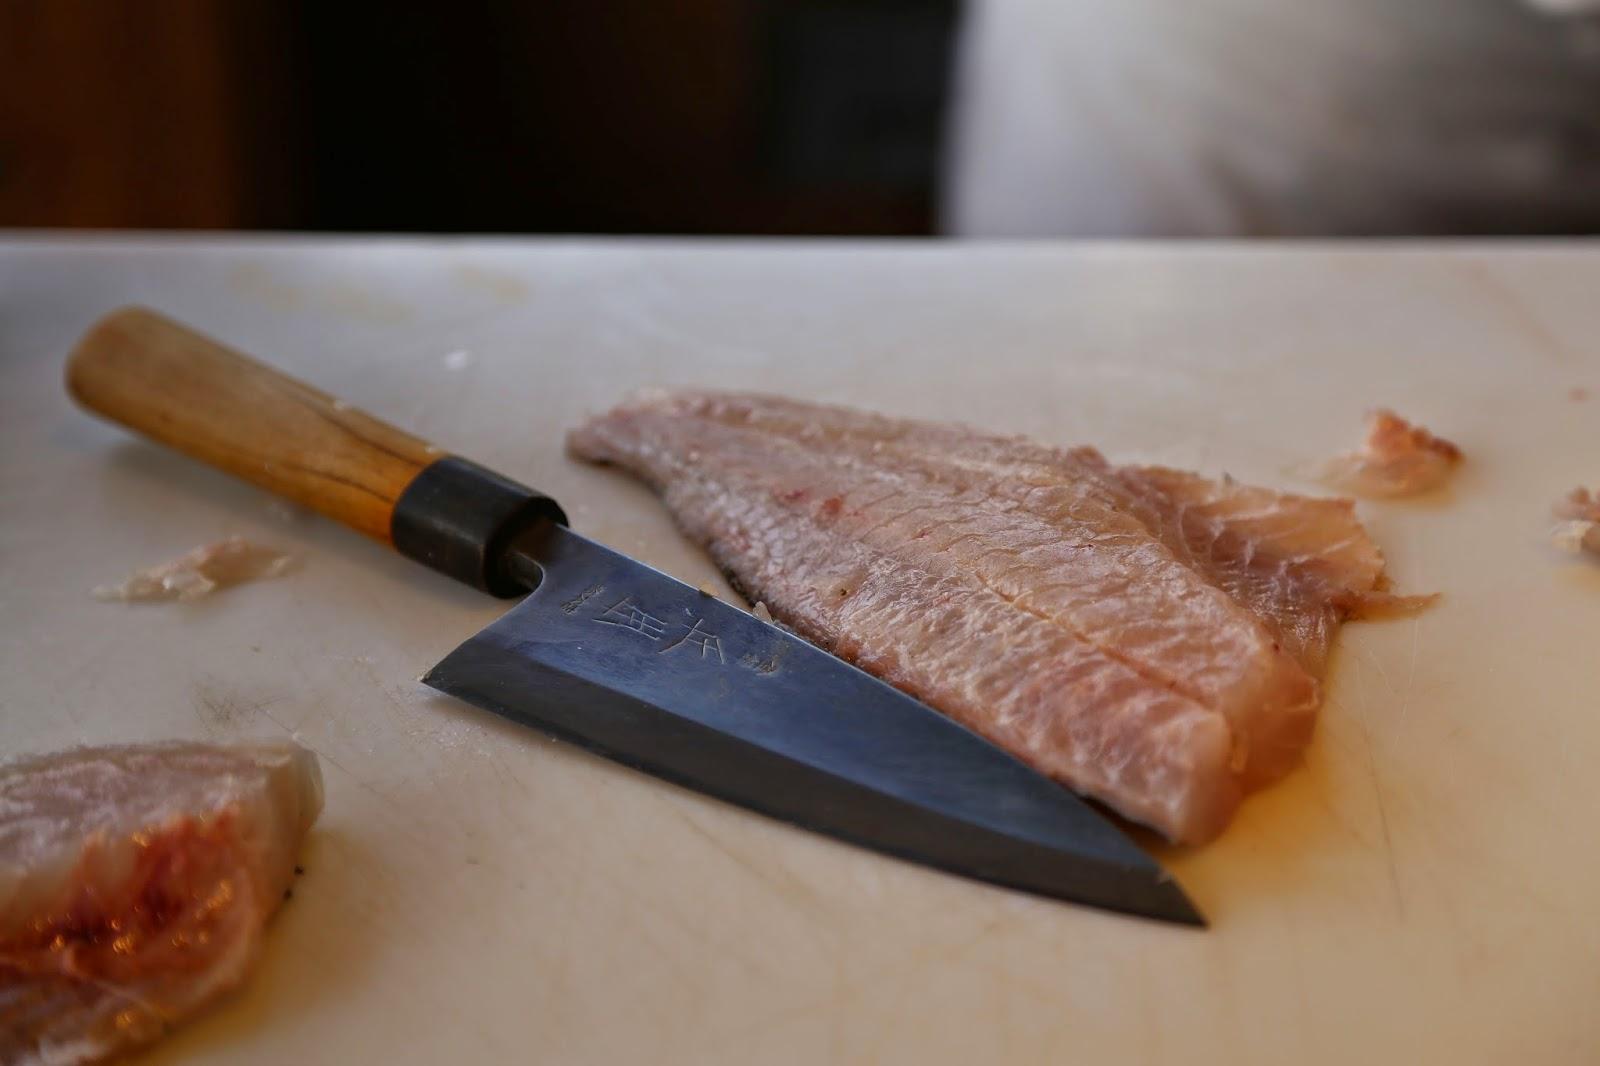 deba knife,used by japanese chef